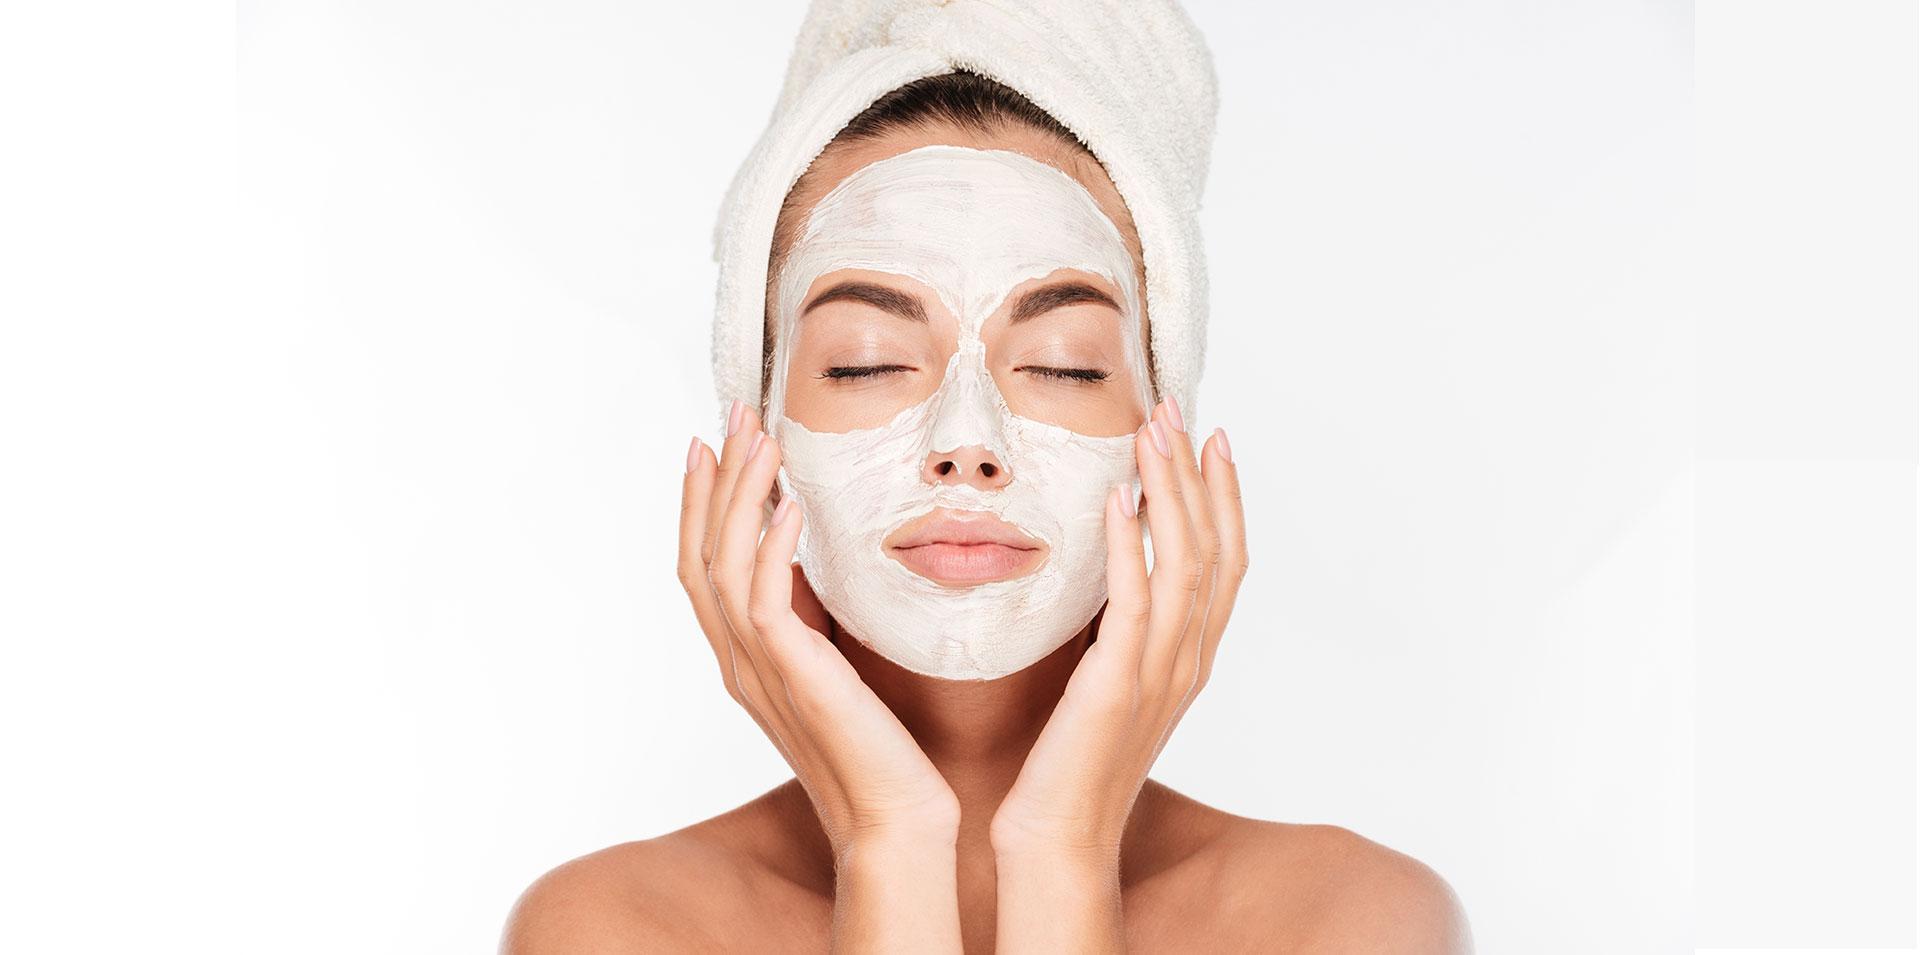 6 Step DIY Facial for Radiant Skin